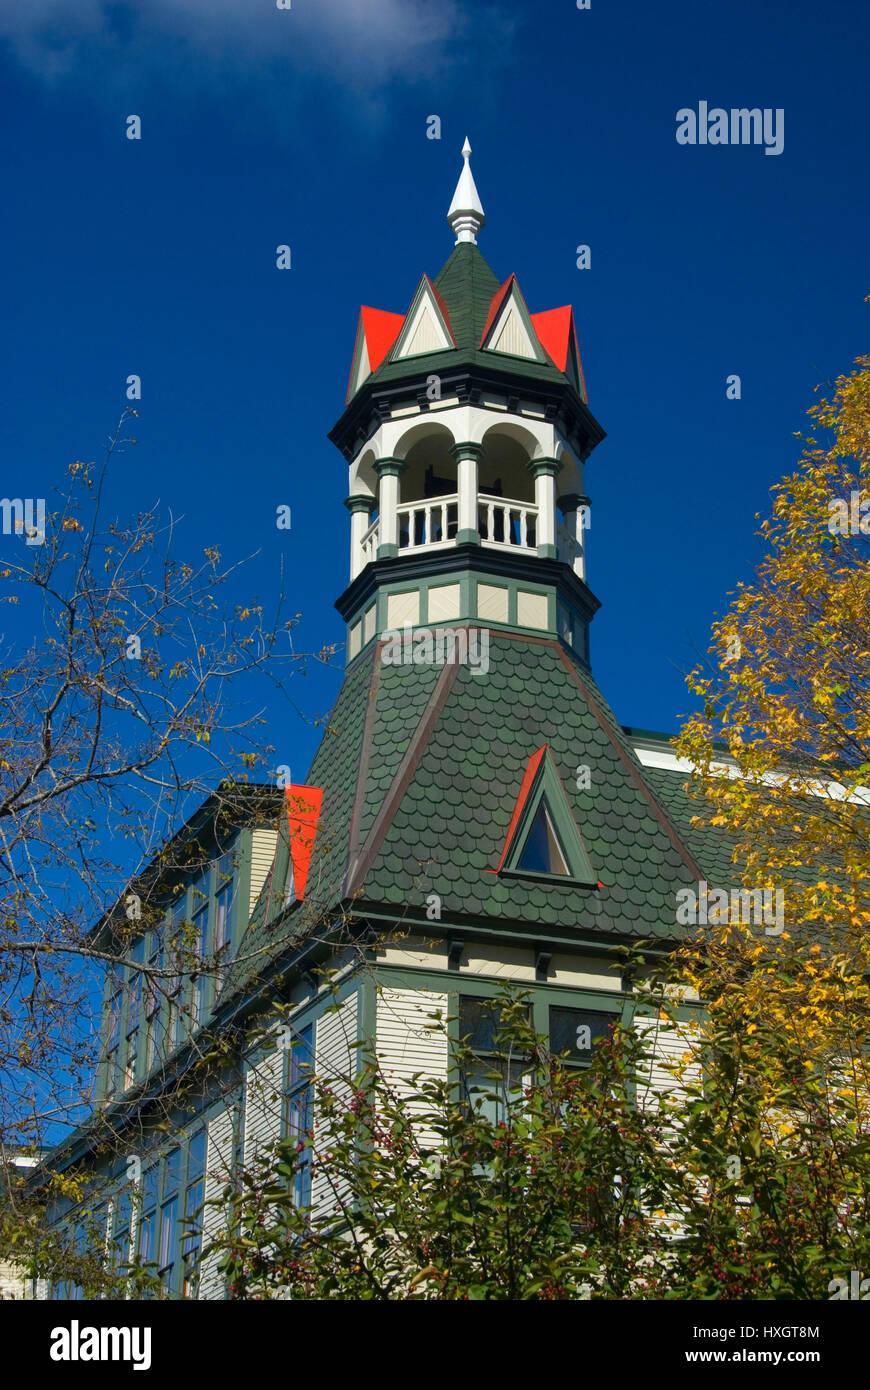 Debevoise Hall steeple, Vermont Law School, South Royalton